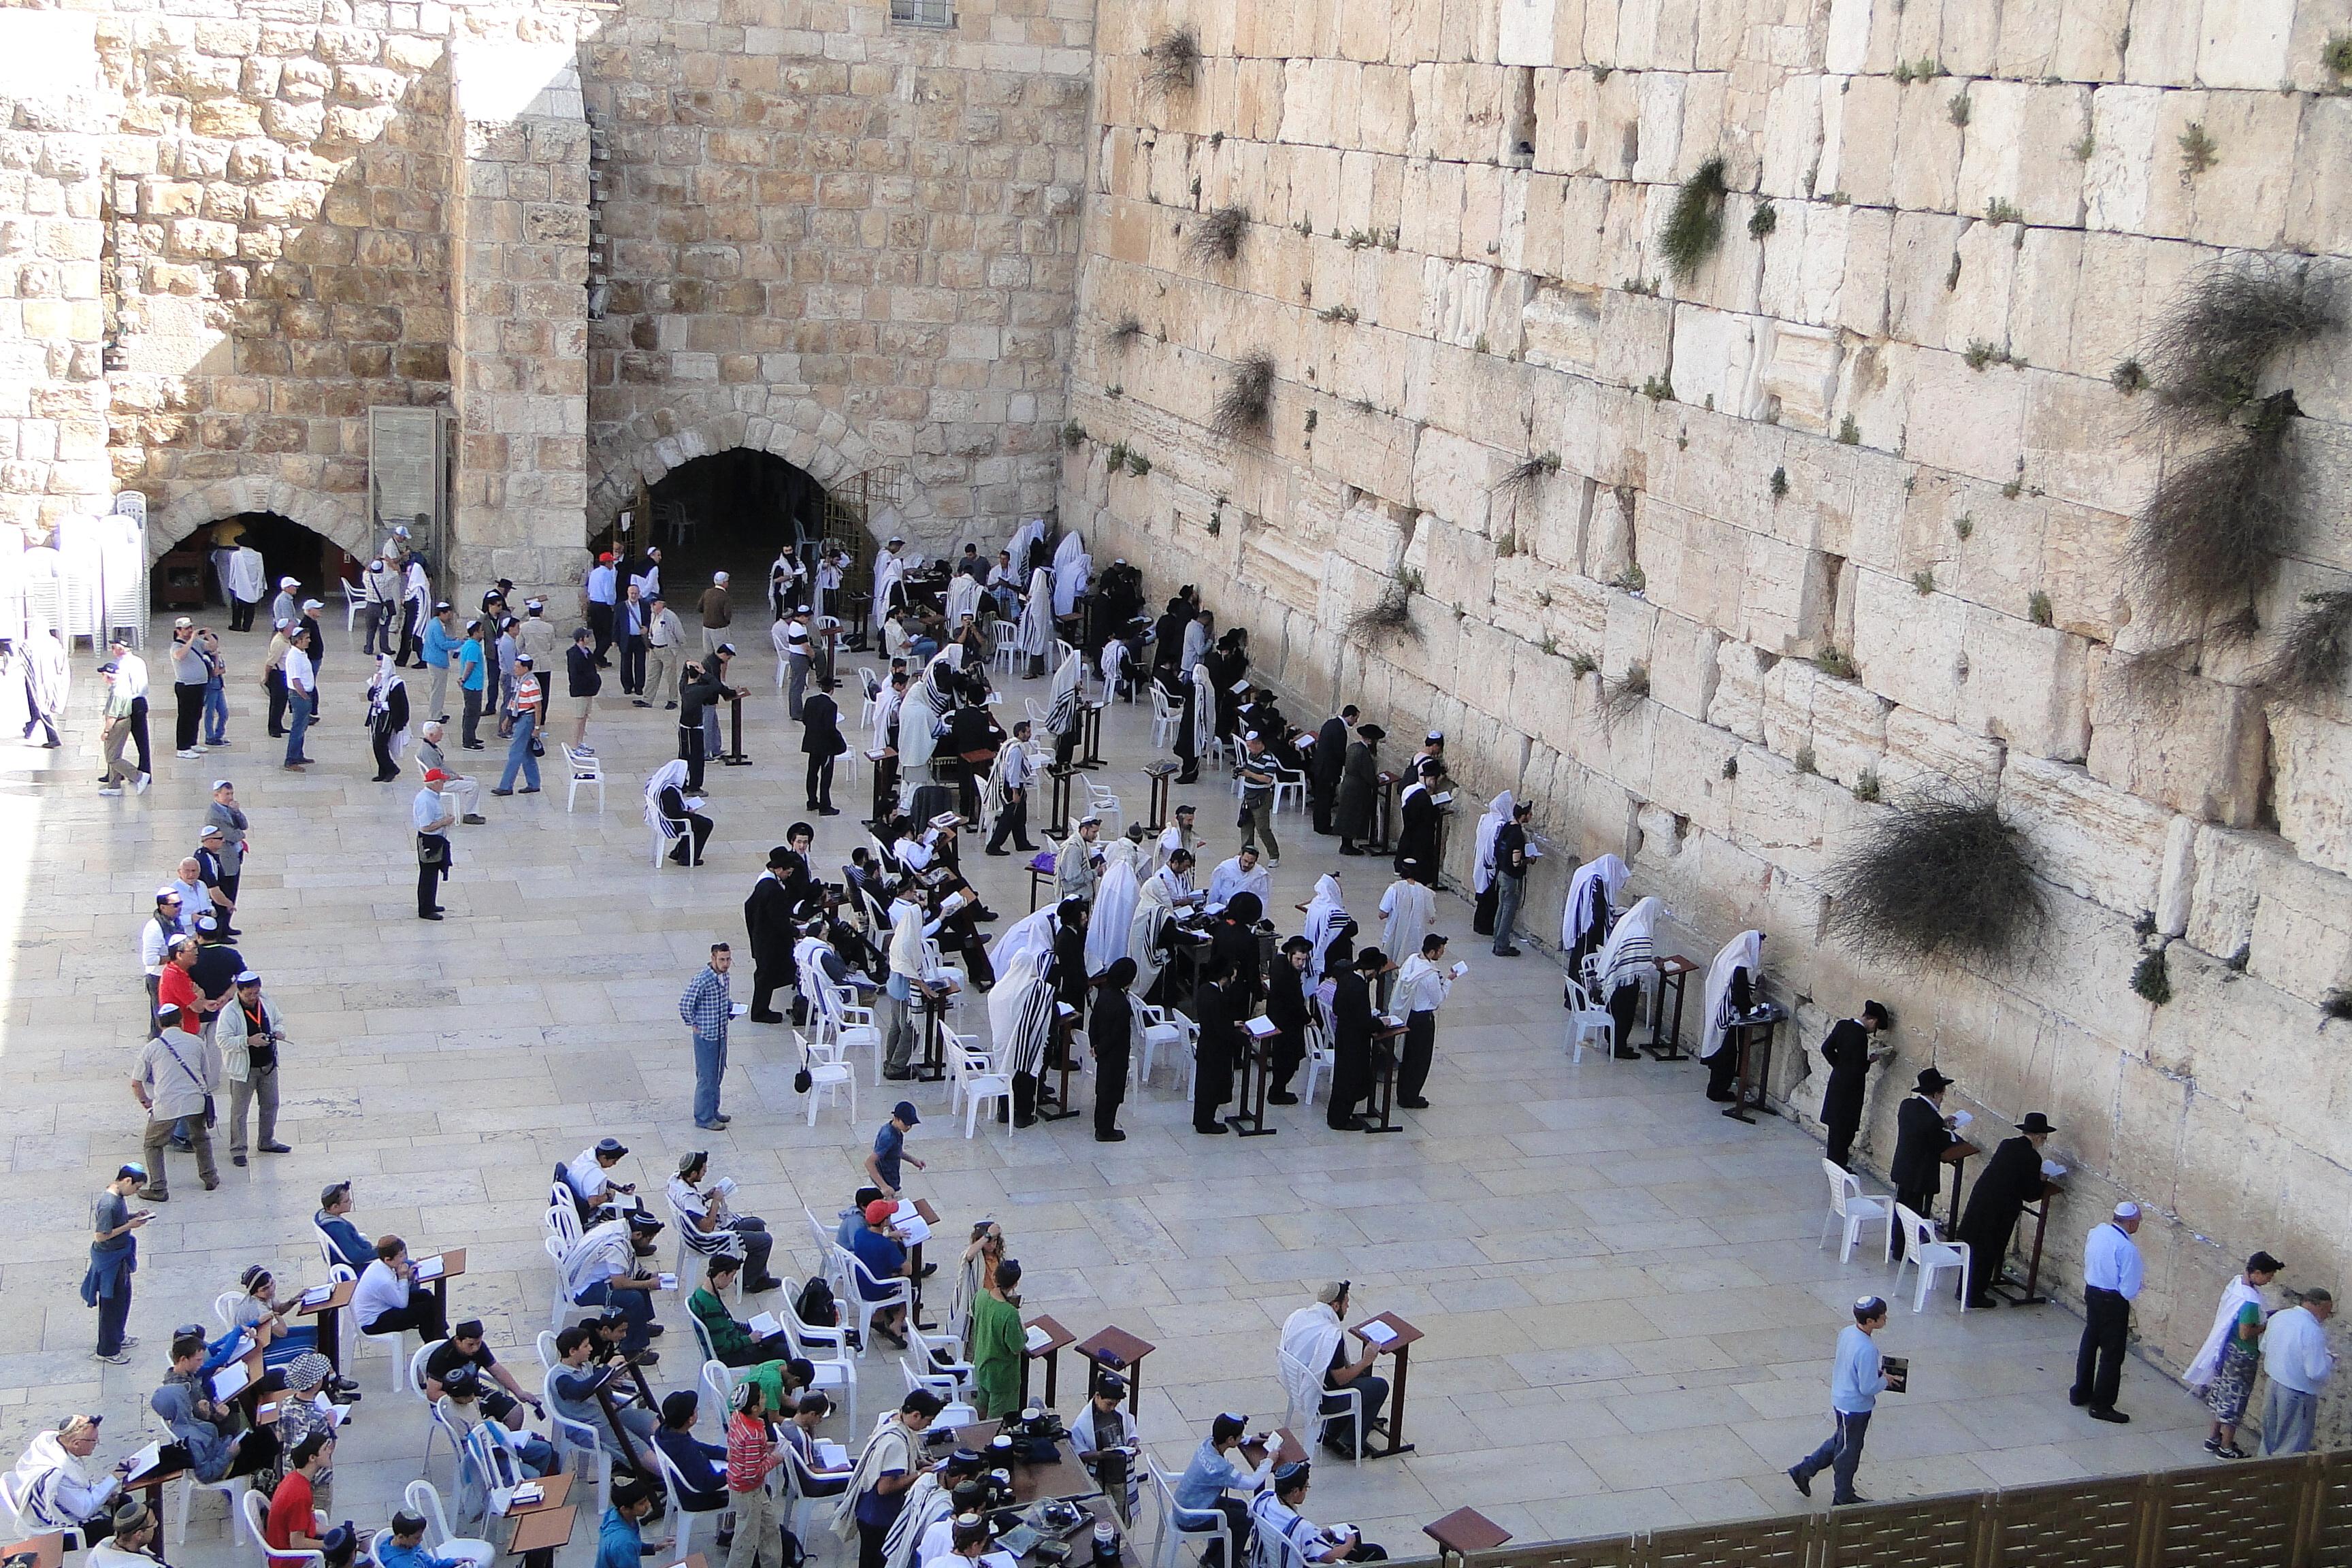 File:Morning Prayers at the Western (Wailing) Wall - Old City - Jerusalem -  Israel - 01 (5683927837).jpg - Wikimedia Commons